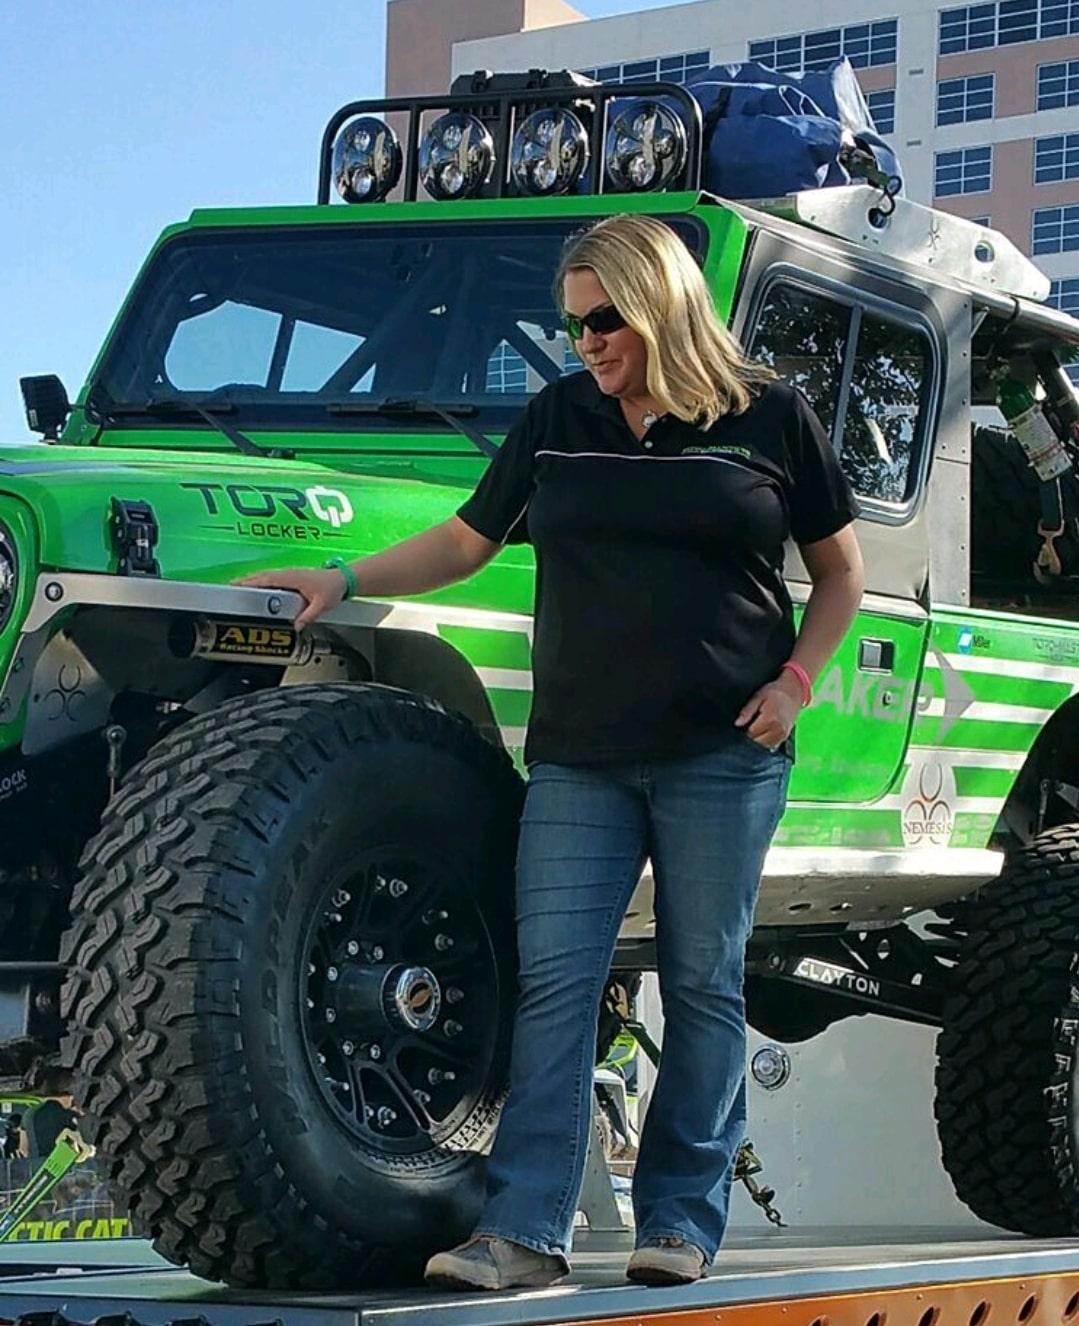 Cora Jokinen -Rochester NY - 2005 Jeep Wrangler Unlimited LJ